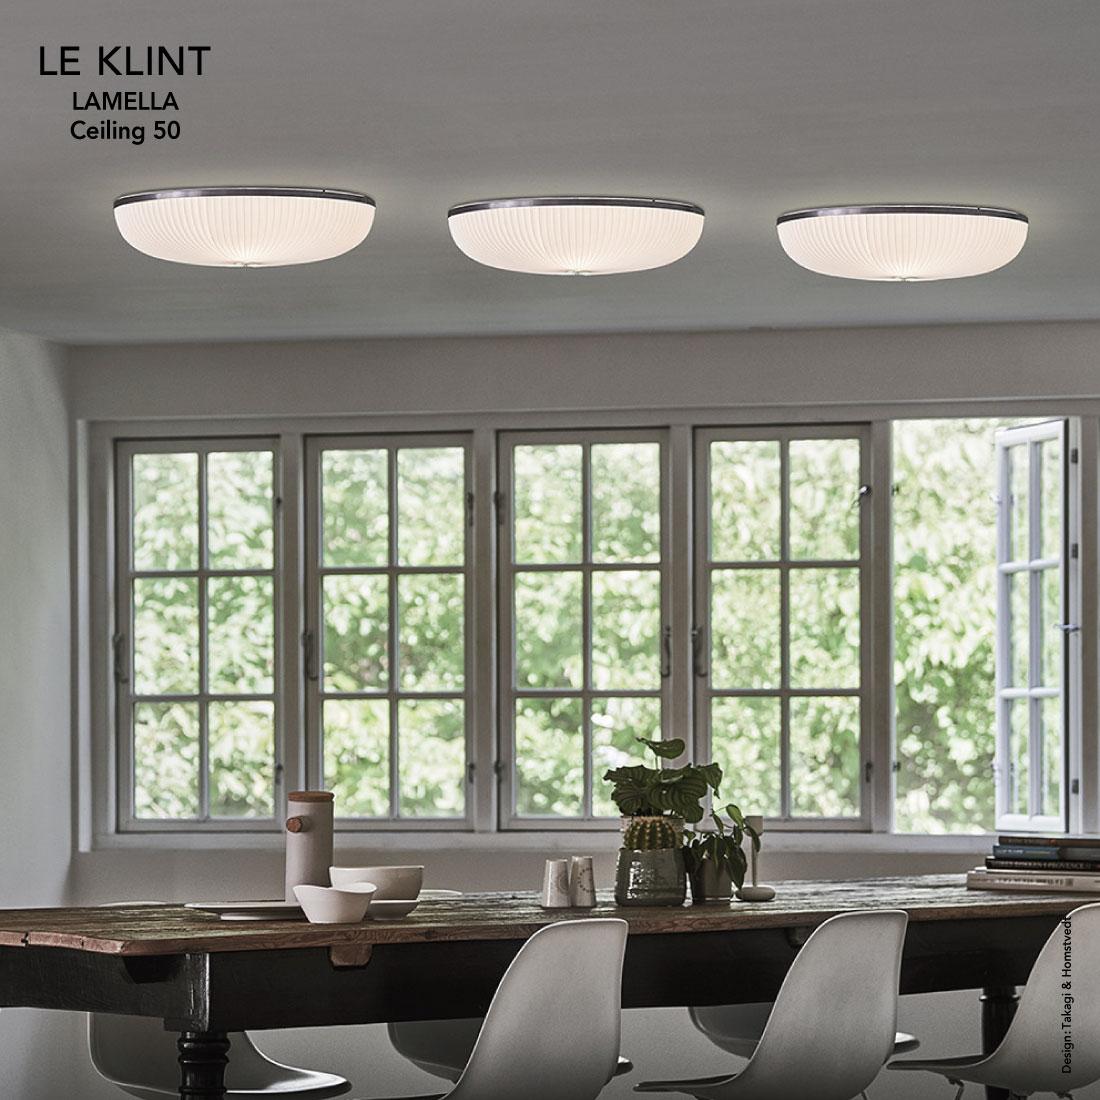 【LE KLINT/レ・クリント】LAMELLA Ceiling 50 Takagi & Homstvedt/ラメラ/シーリング50/タカギアンドホムスベット/照明/デンマーク/北欧/デンマーク